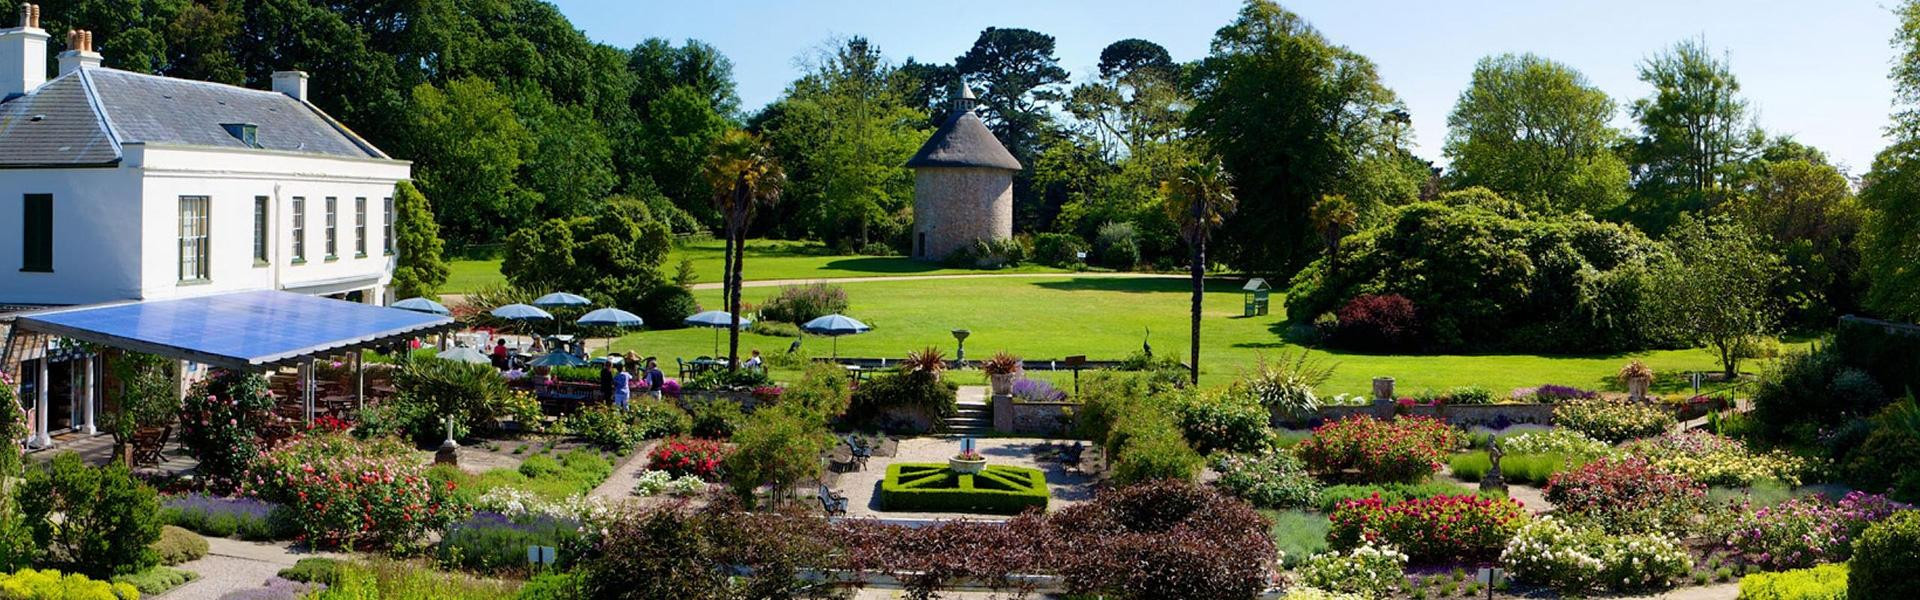 Samares Manor Botanical Gardens